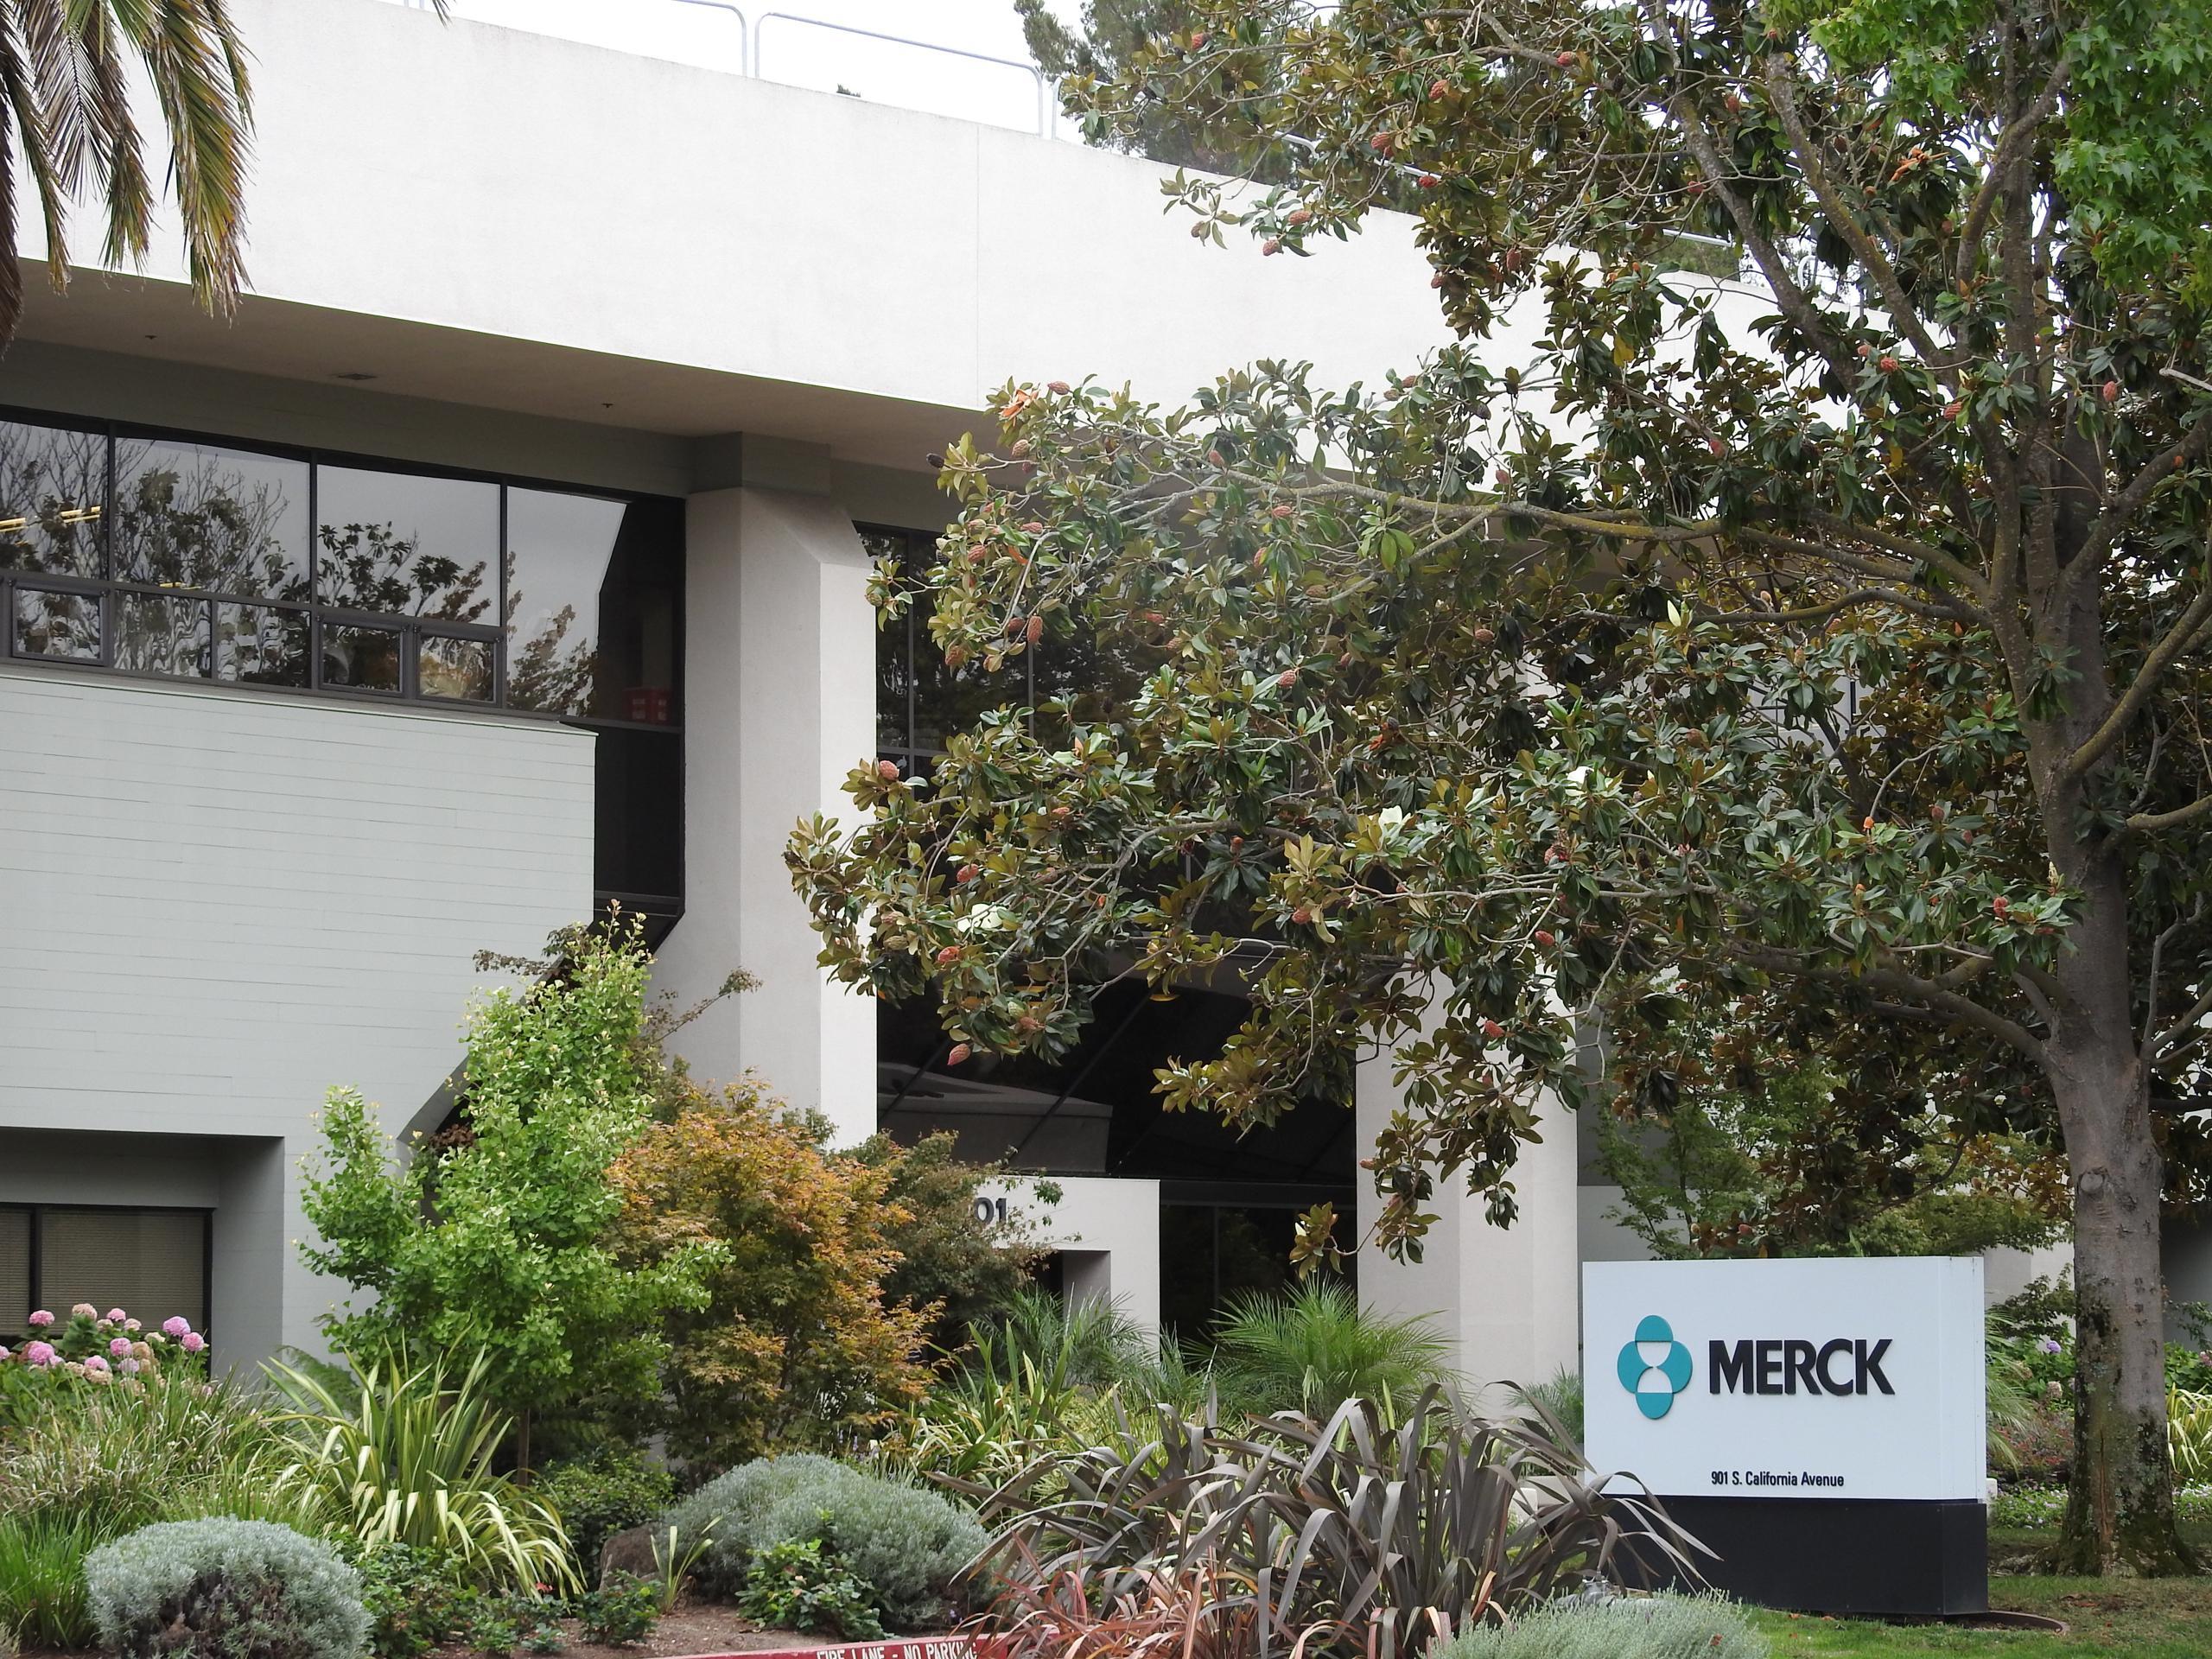 Merck office in Palo Alto, California.